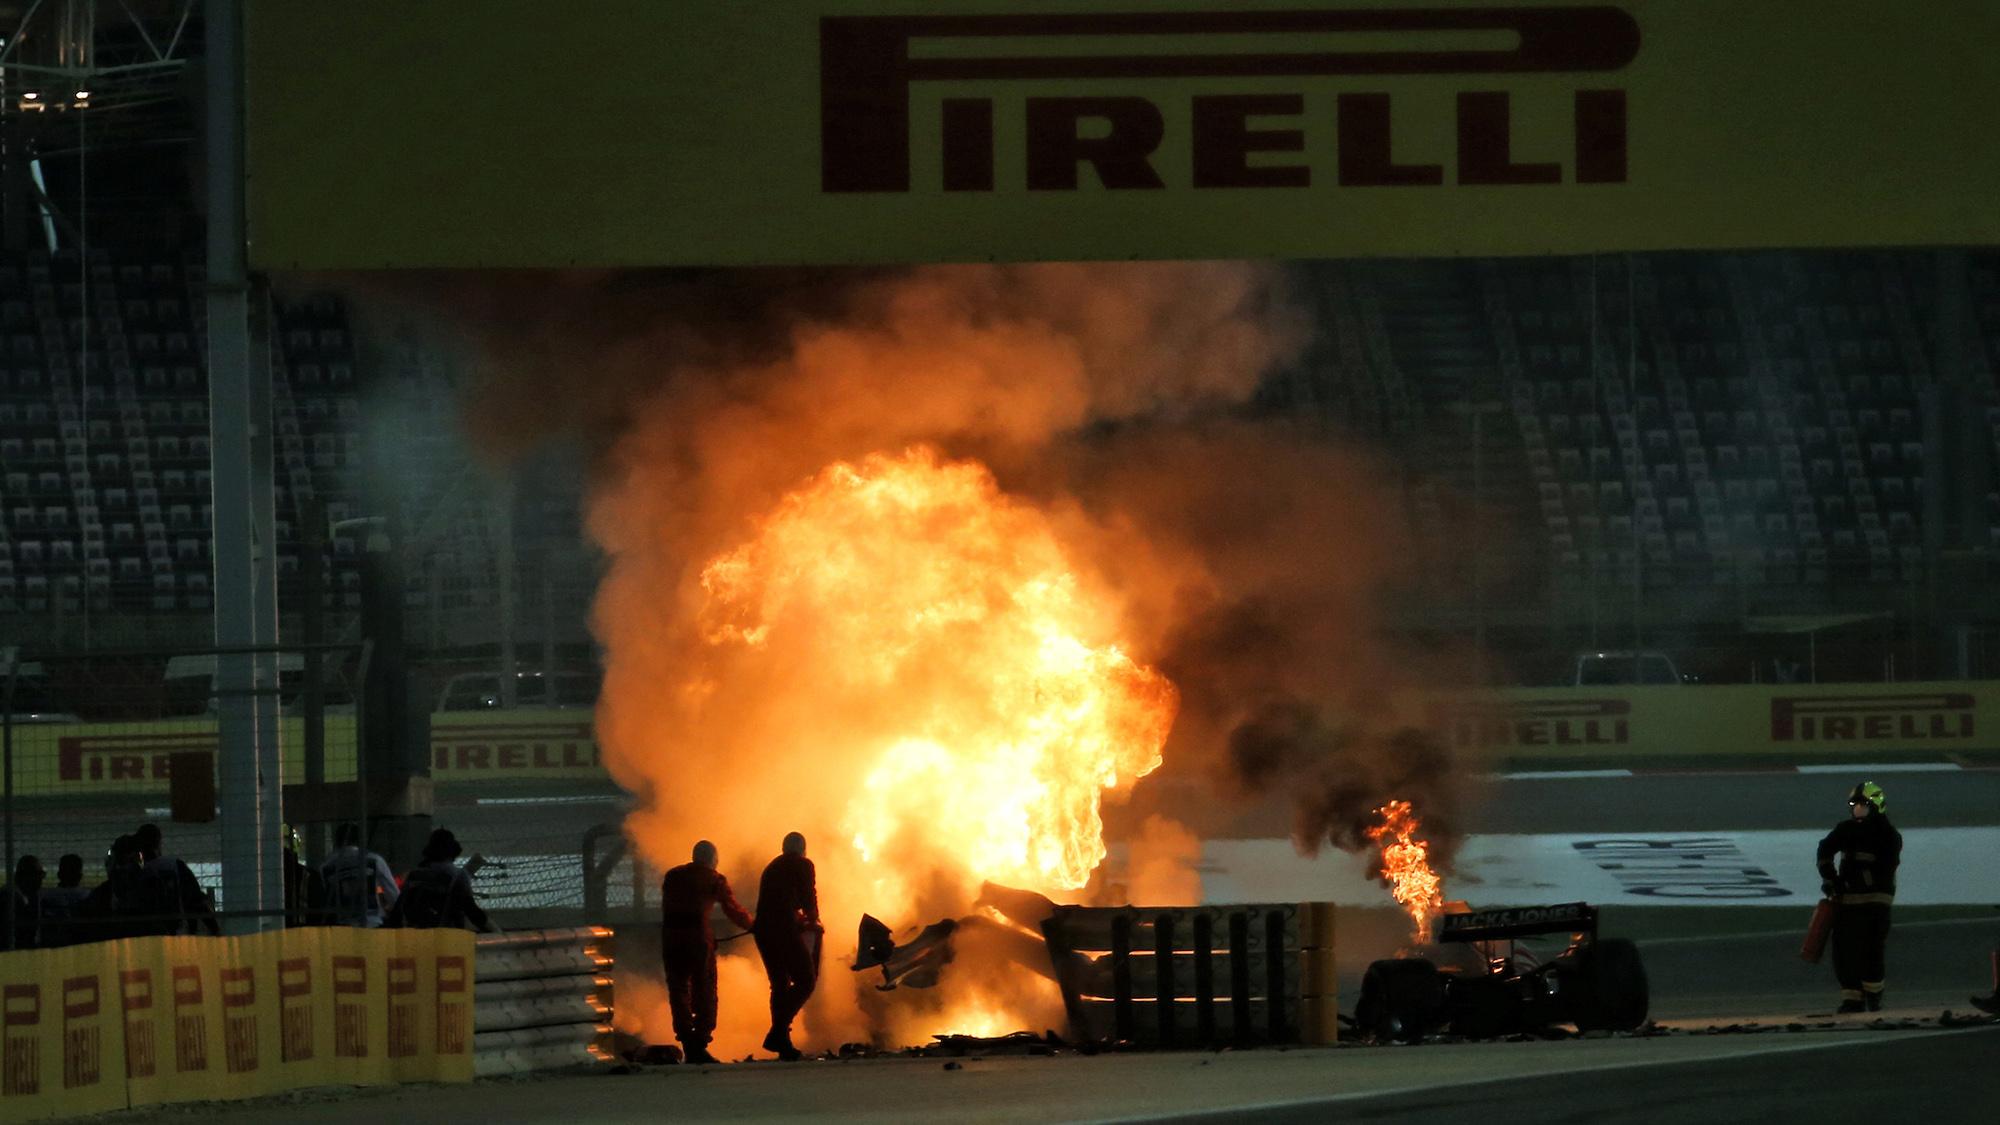 Romain Grosjean's Haas in flames at the 2020 F1 Bahrain Grand Prix